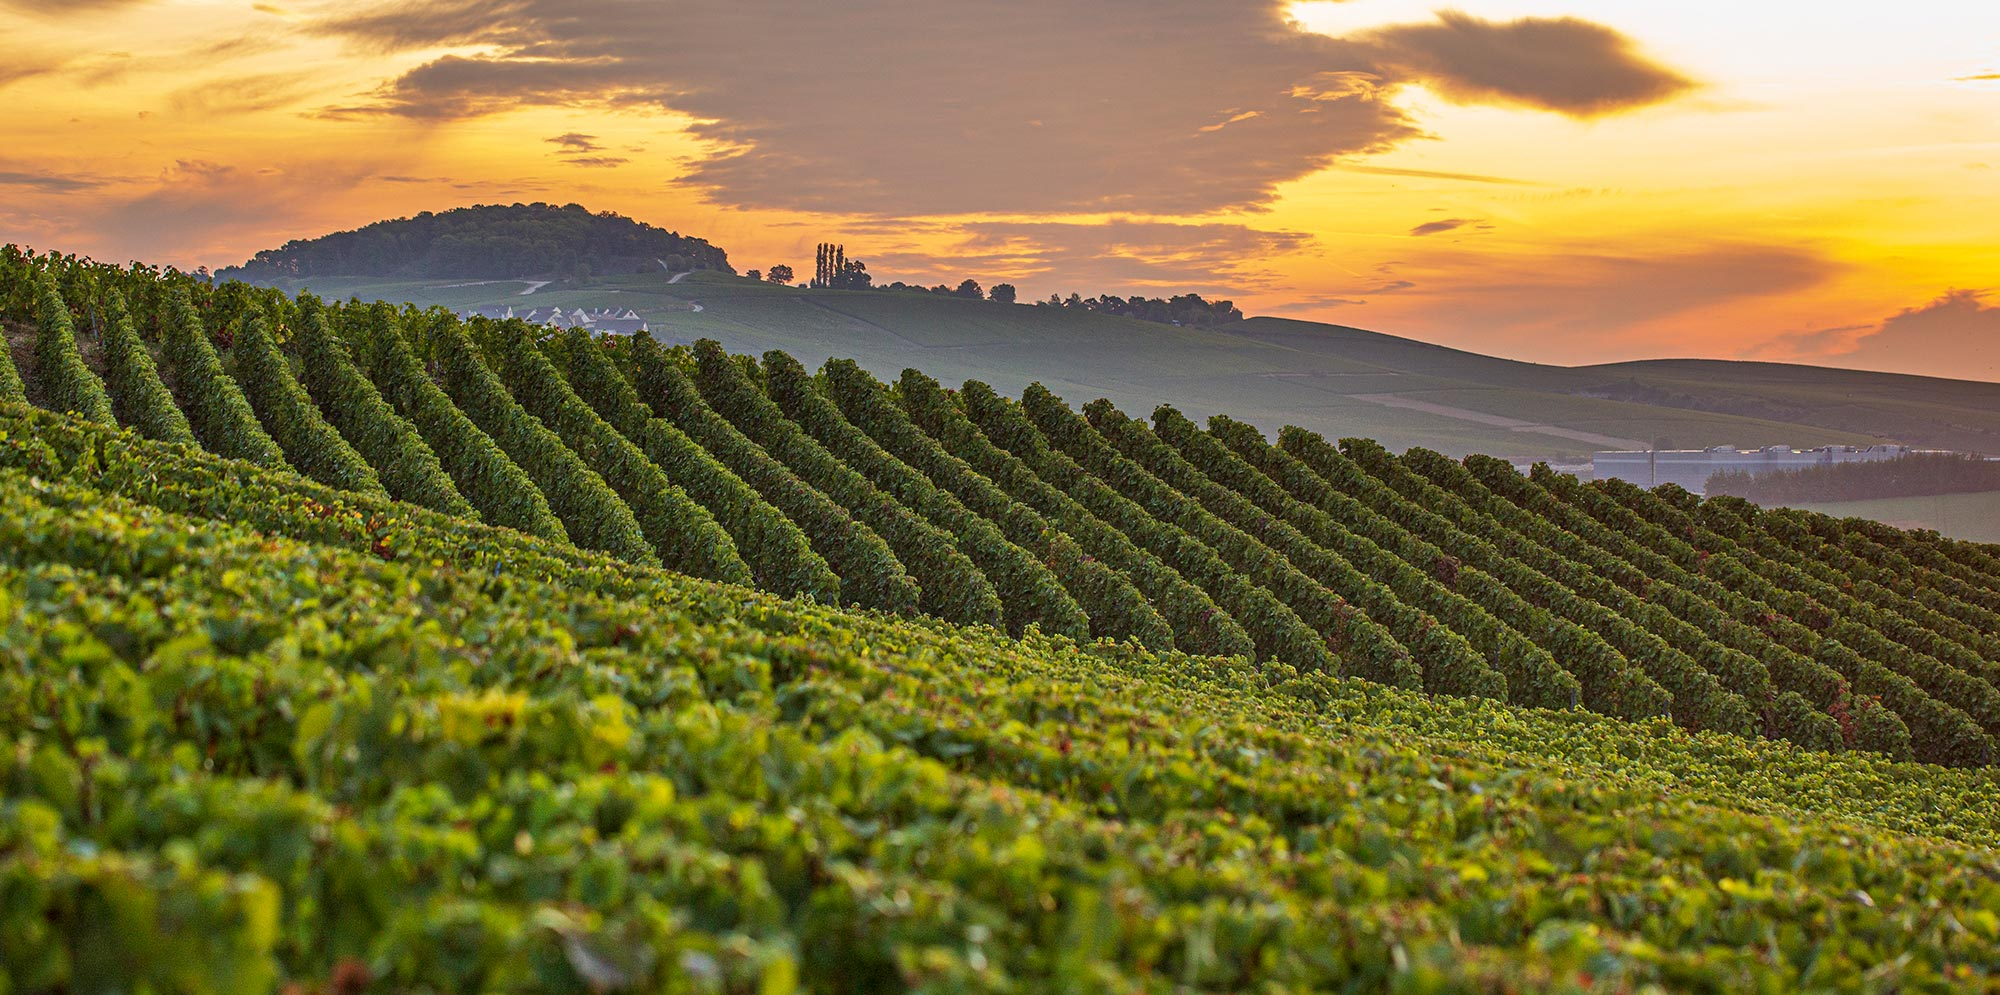 Taittinger-vineyards-sunset-2019